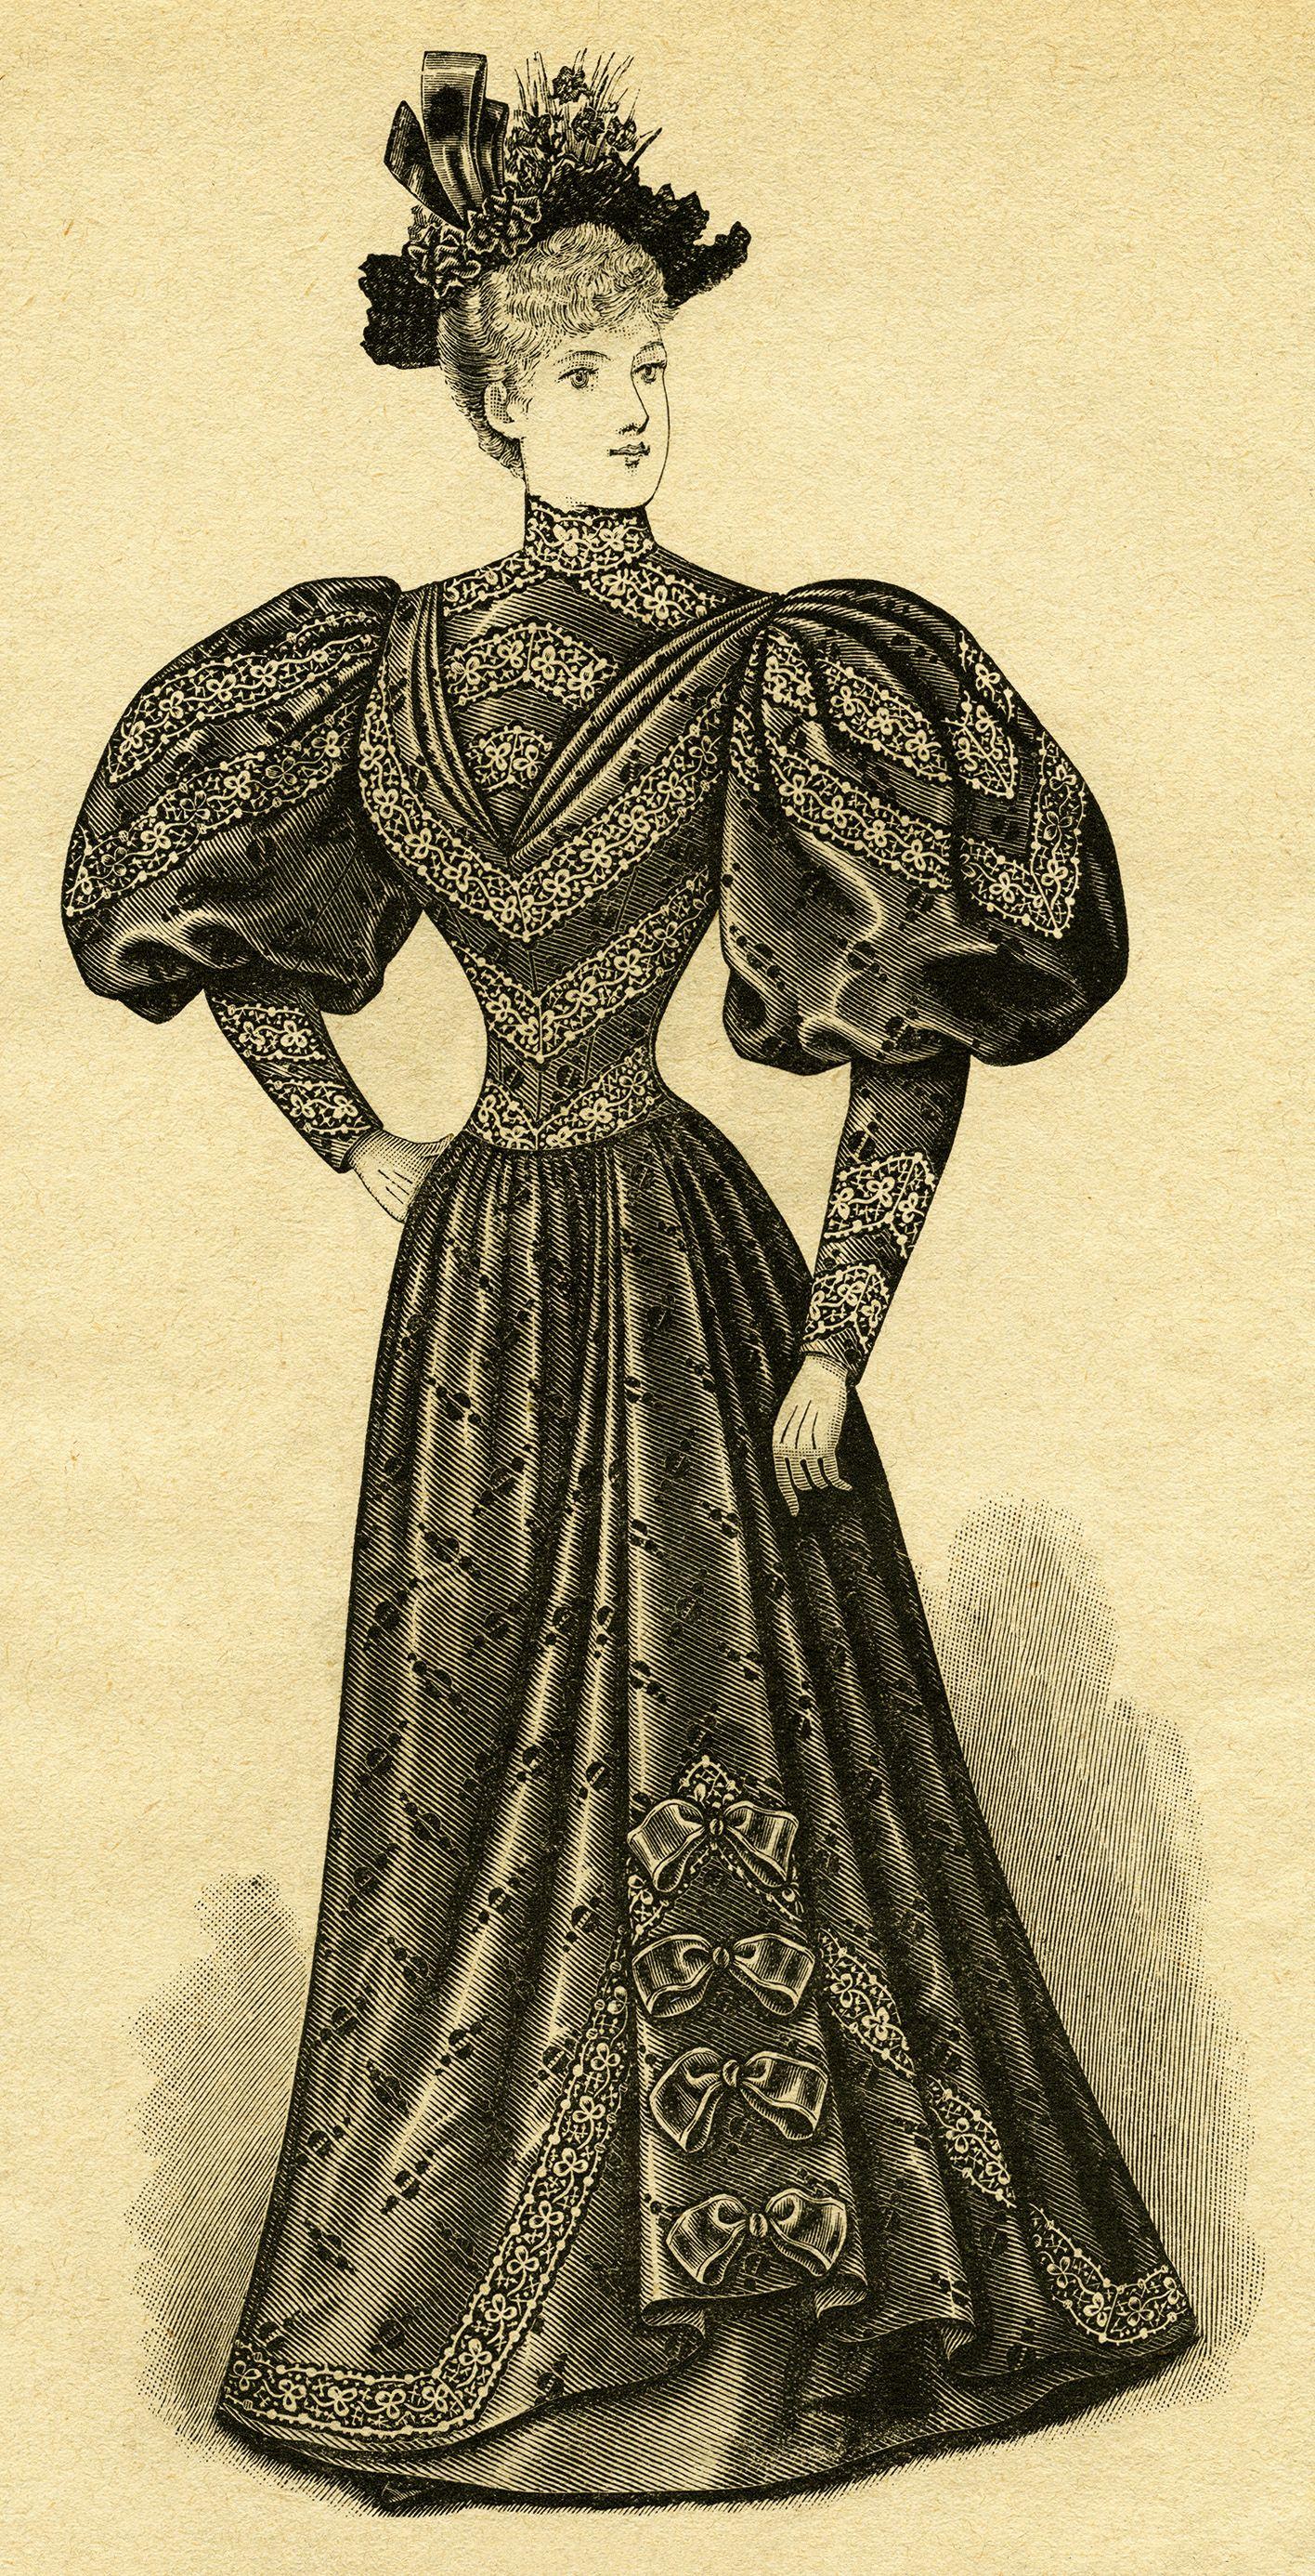 black and white clip art, Edwardian fashion, vintage dress clipart.